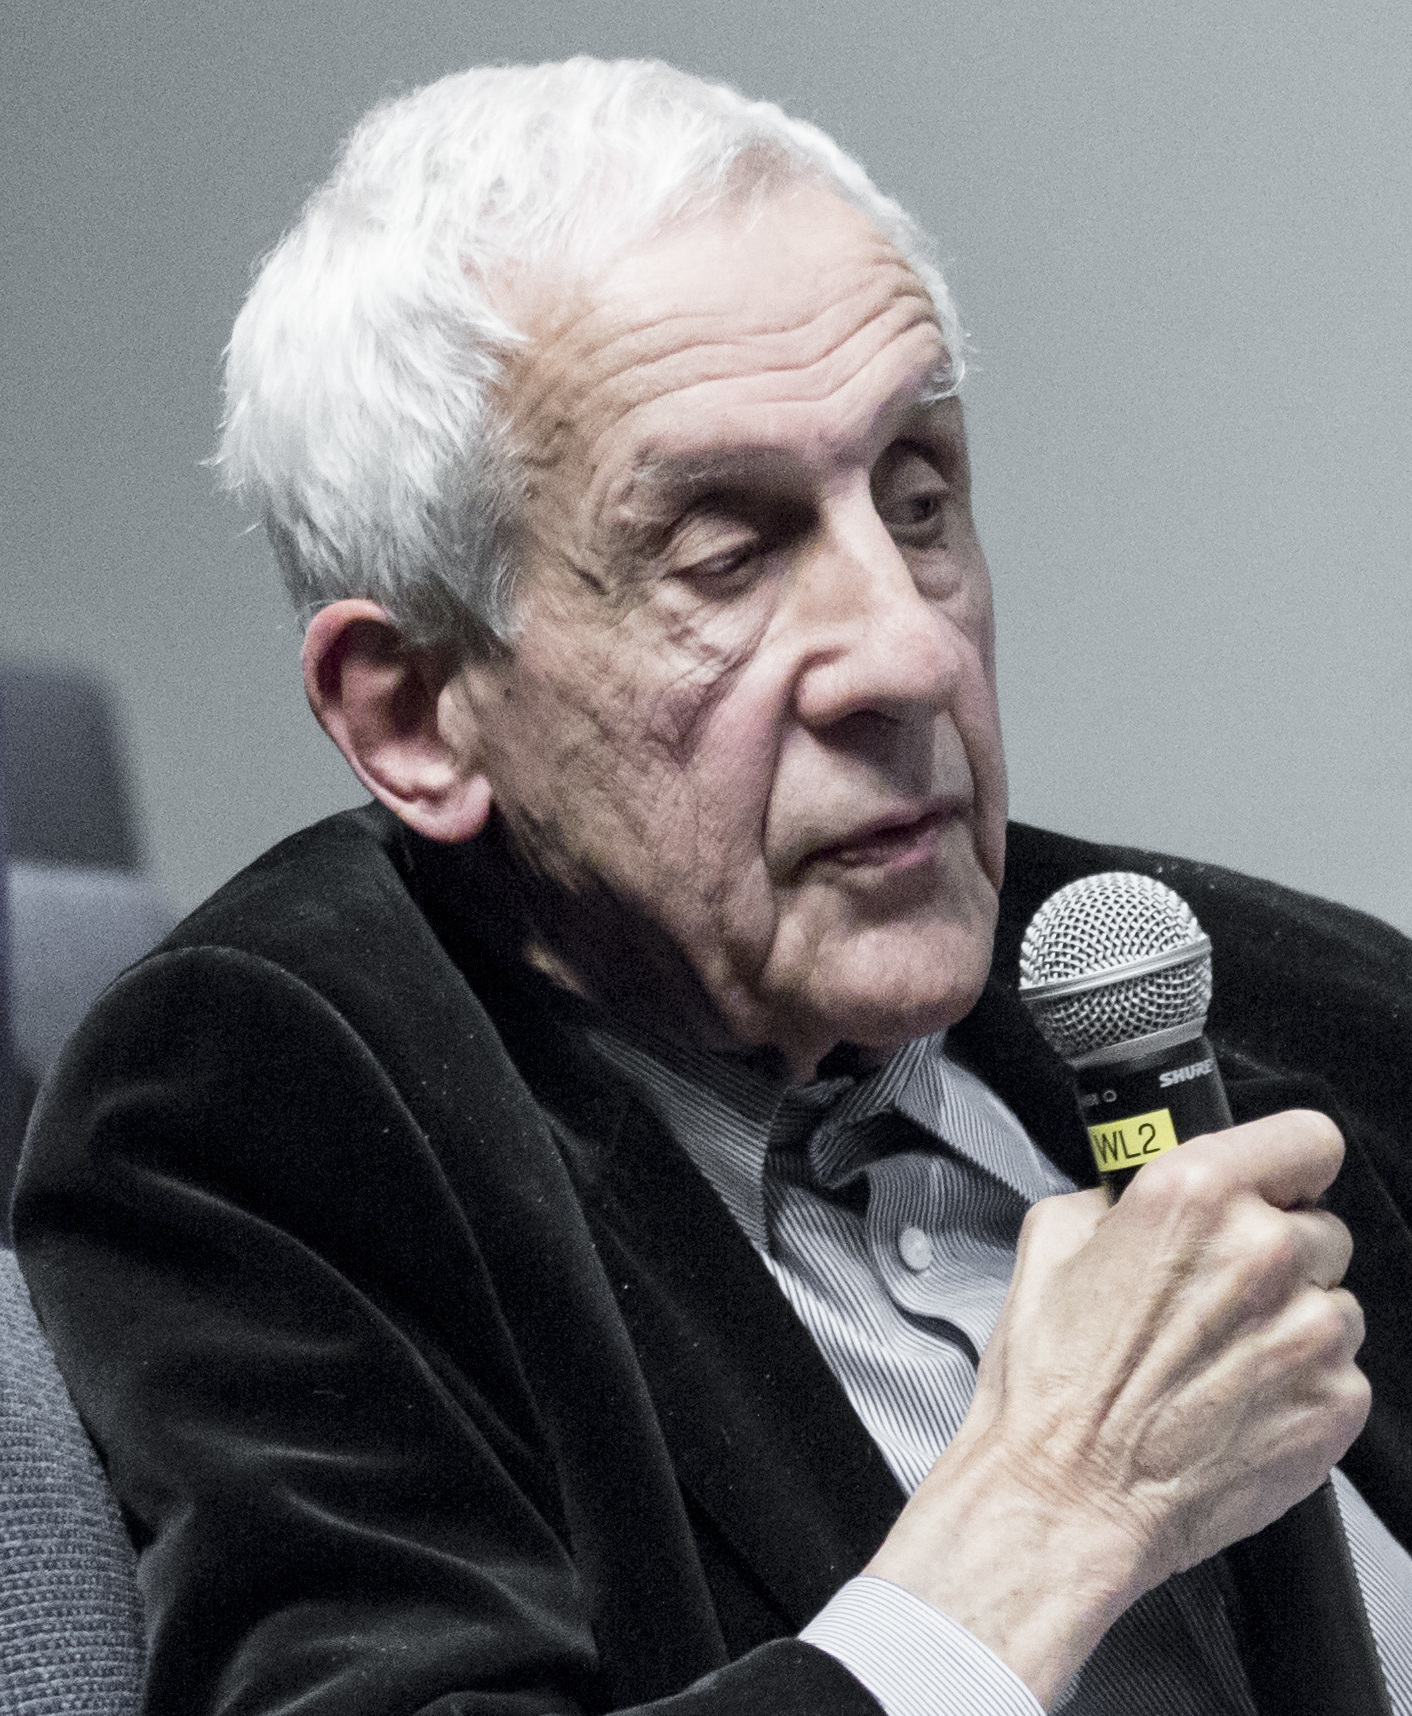 Kenneth Frampton at GSAPP (2014)